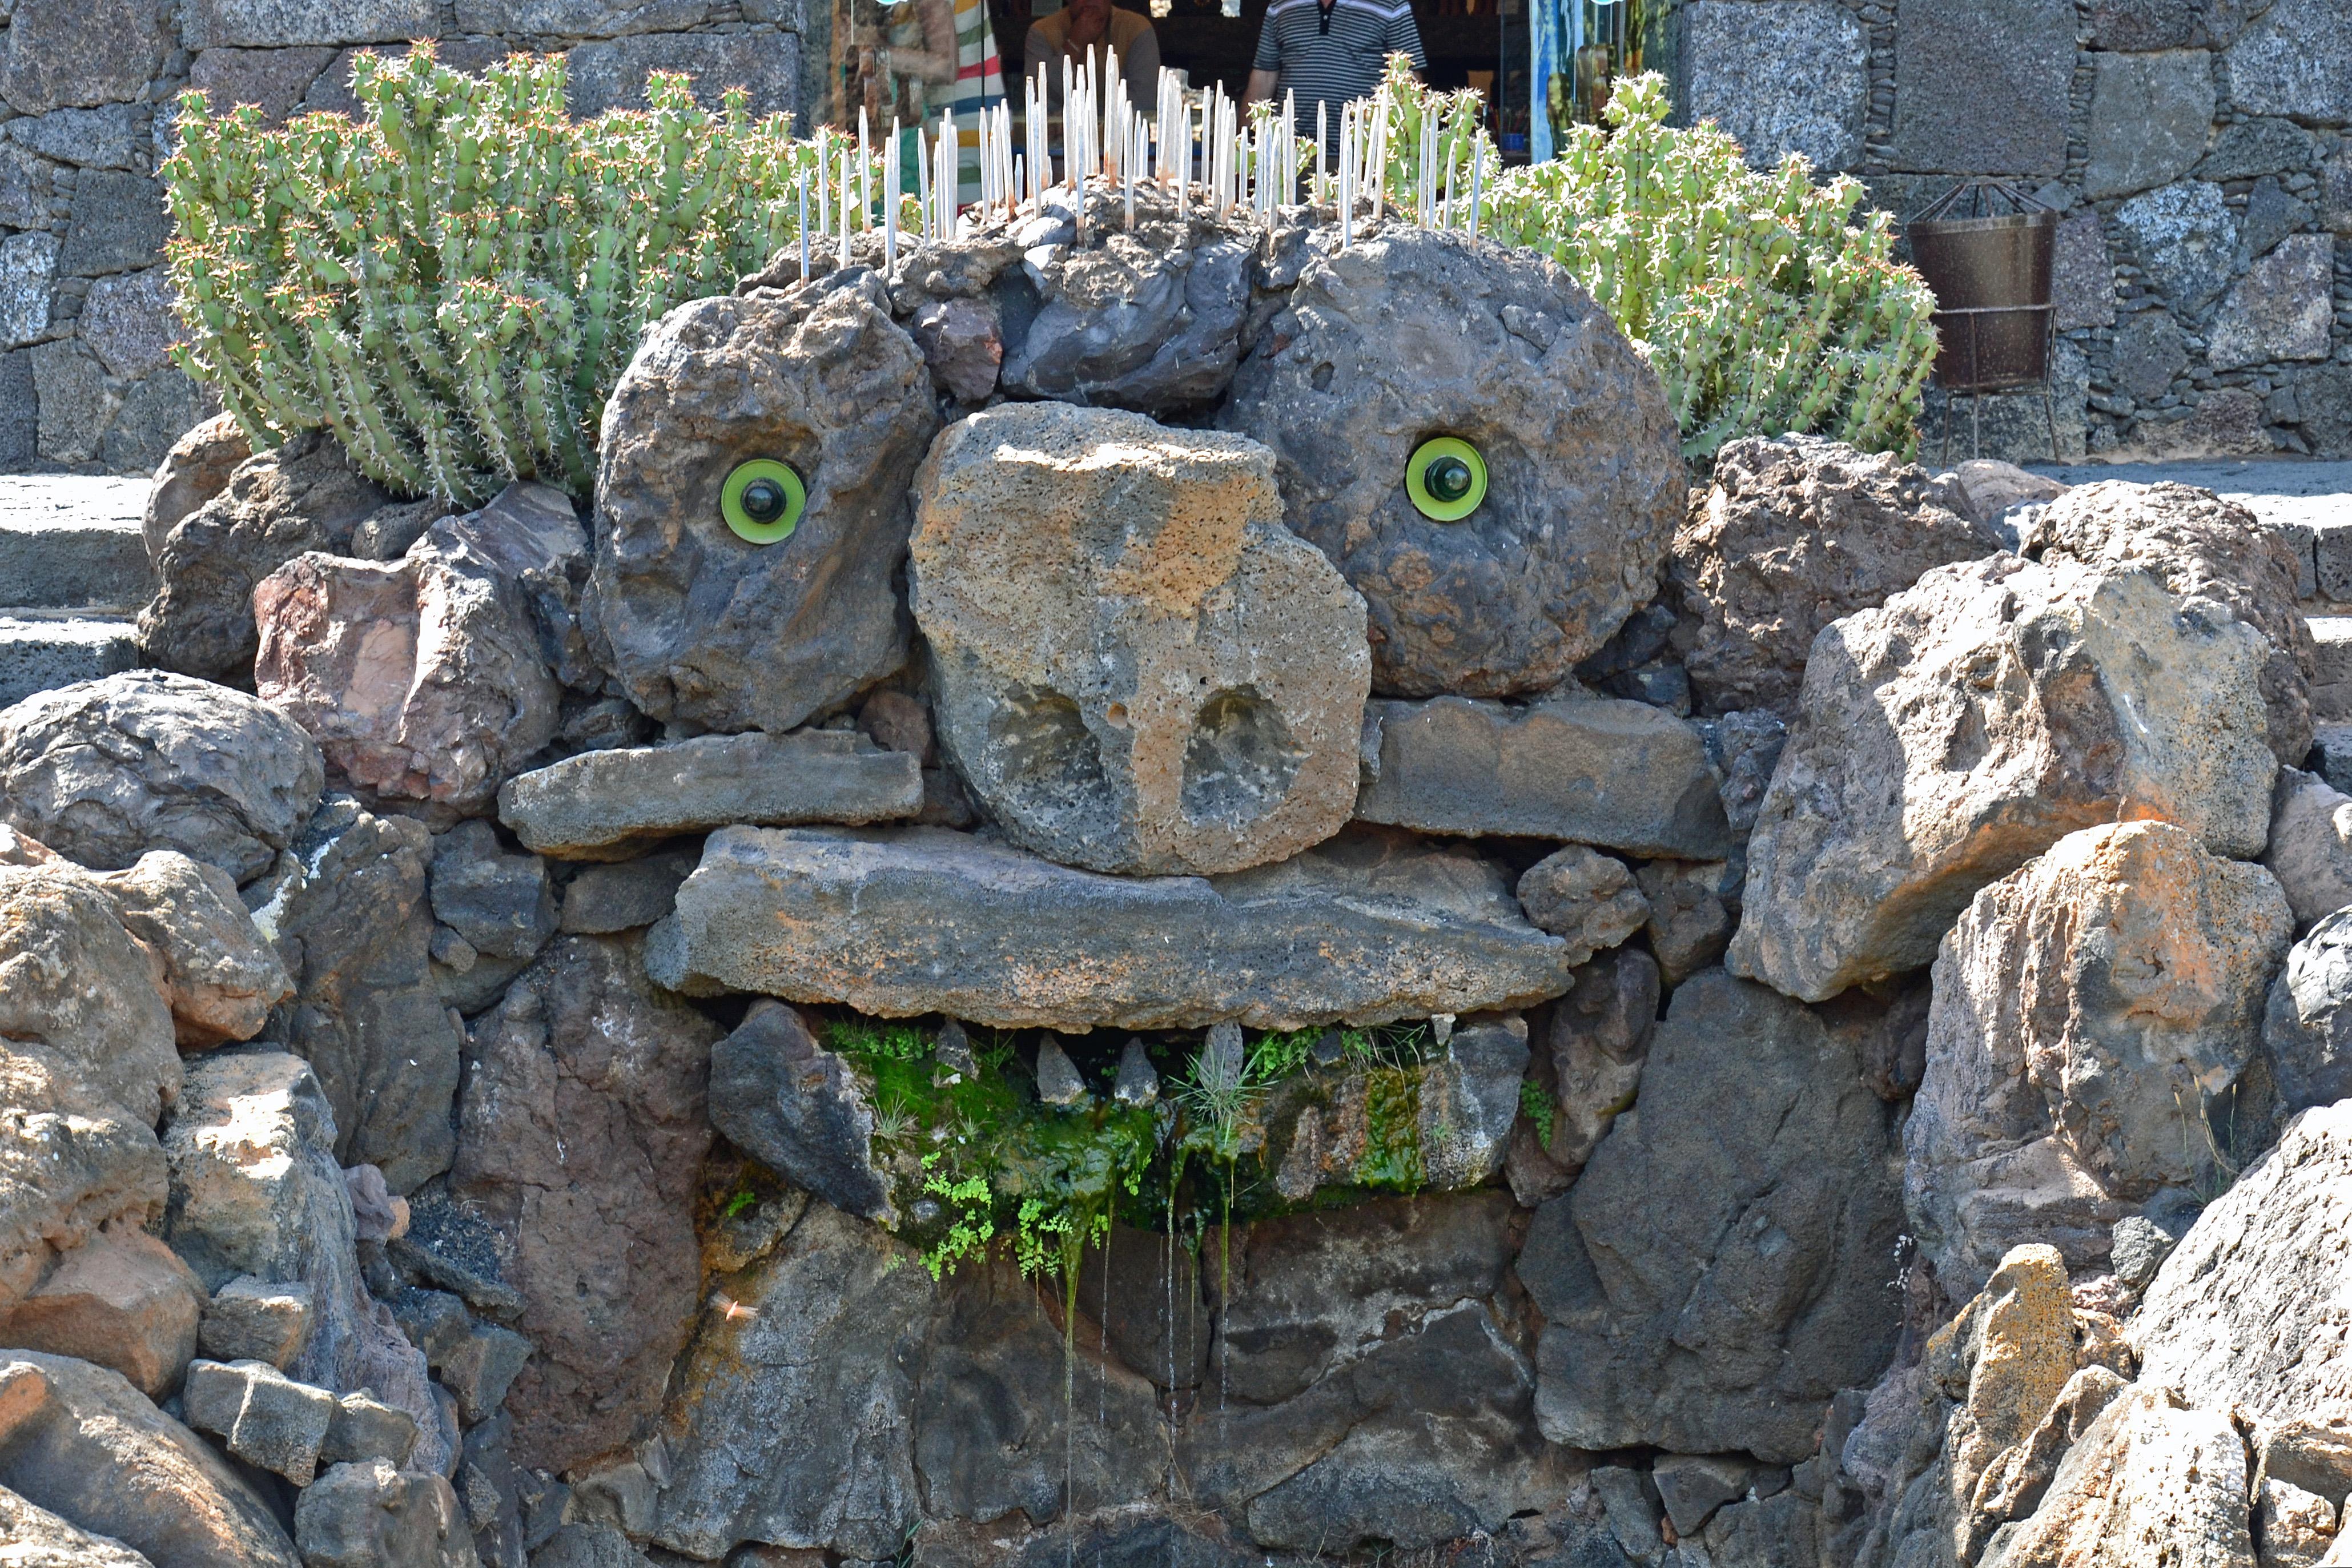 File jardin de cactus lanzarote 02 jpg wikimedia commons for Jardines con cactus